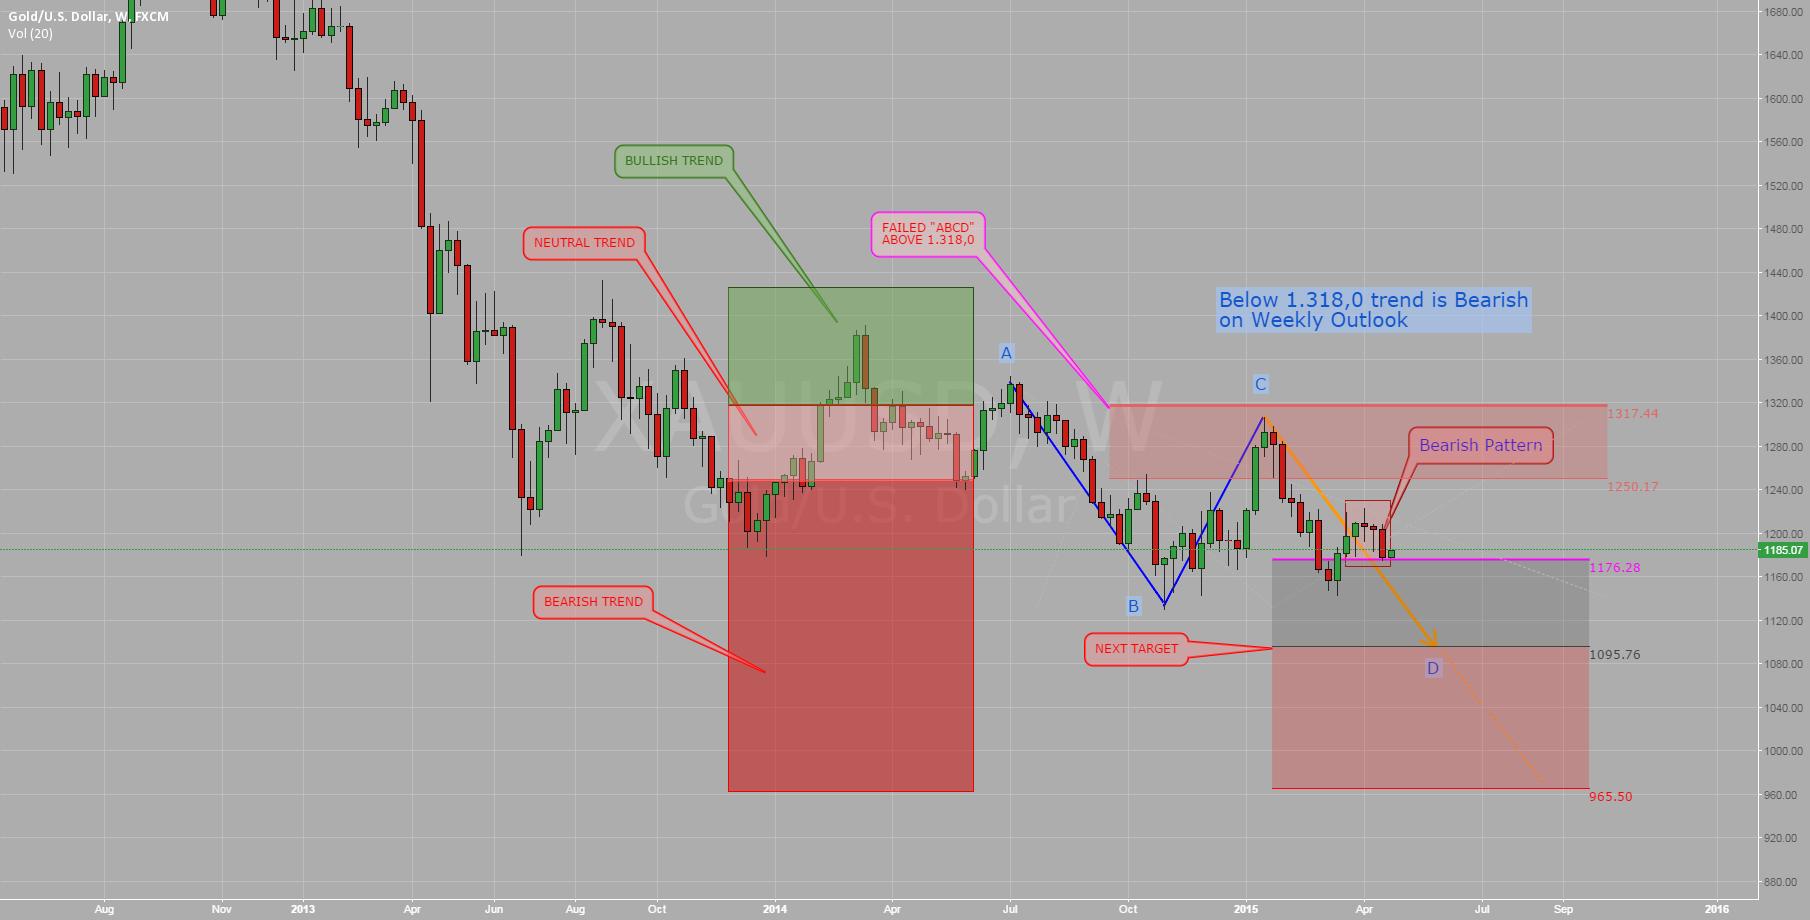 GOLD: bearish trend confirmed?